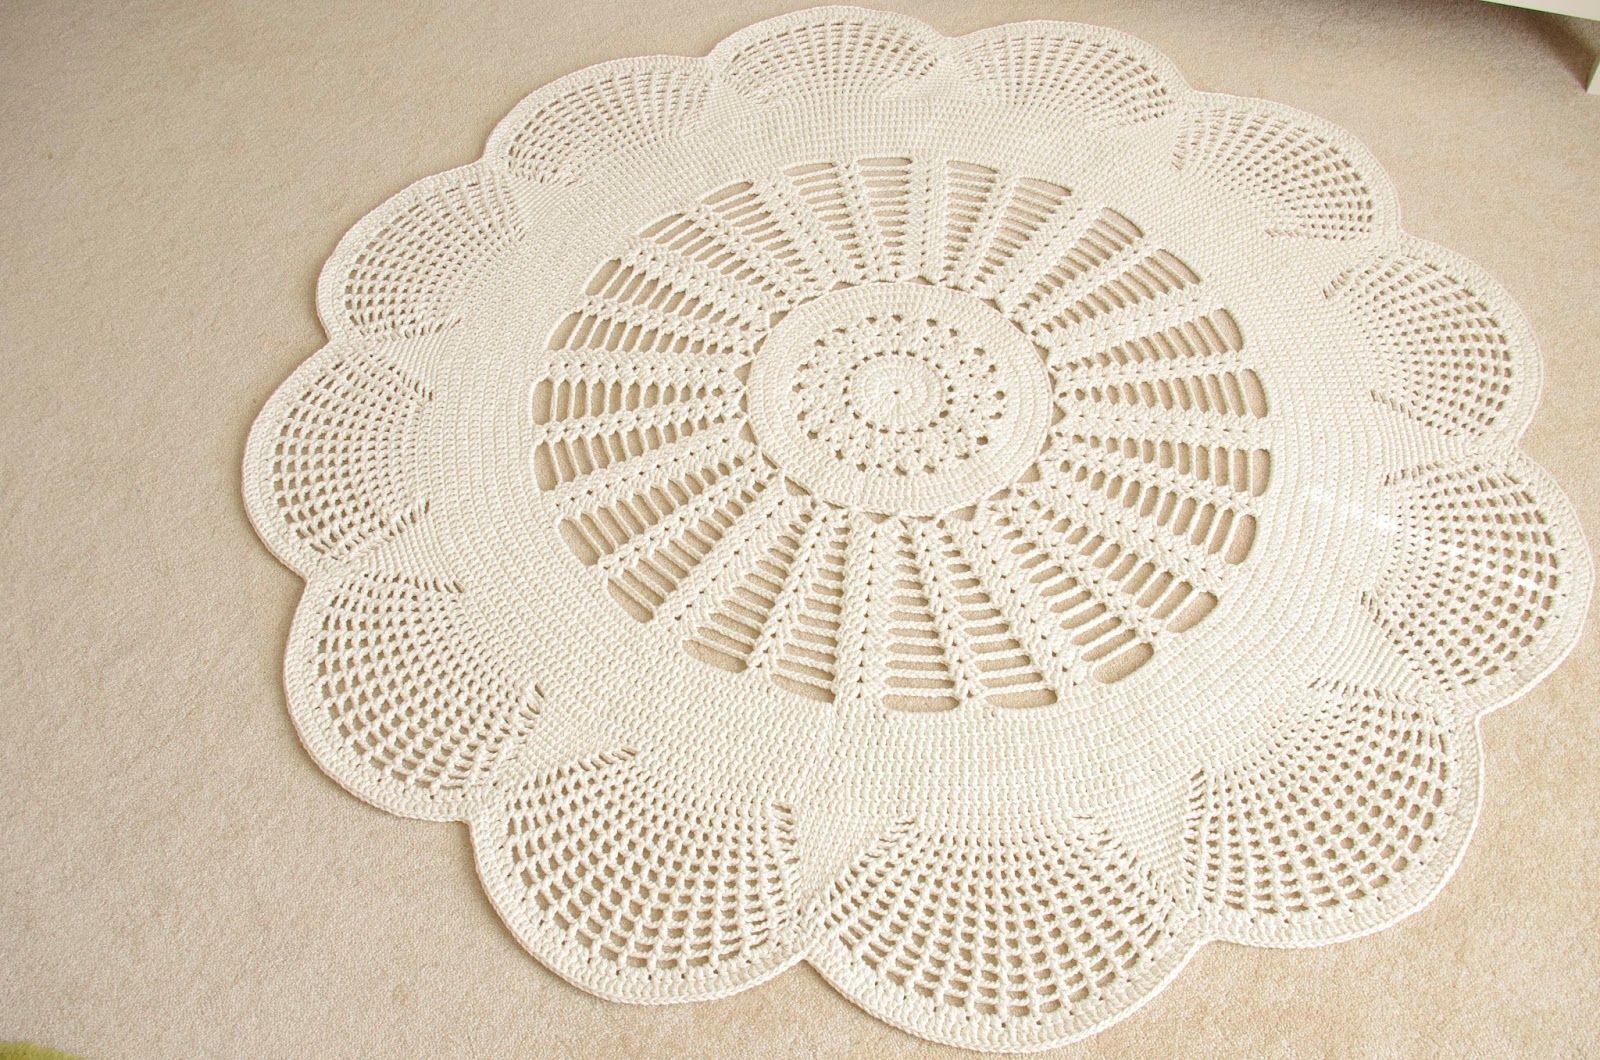 Emily Mega Doily Rug Is Here And Gone Again Com Imagens Tapete De Croche Tecido Artesanal Tapetes